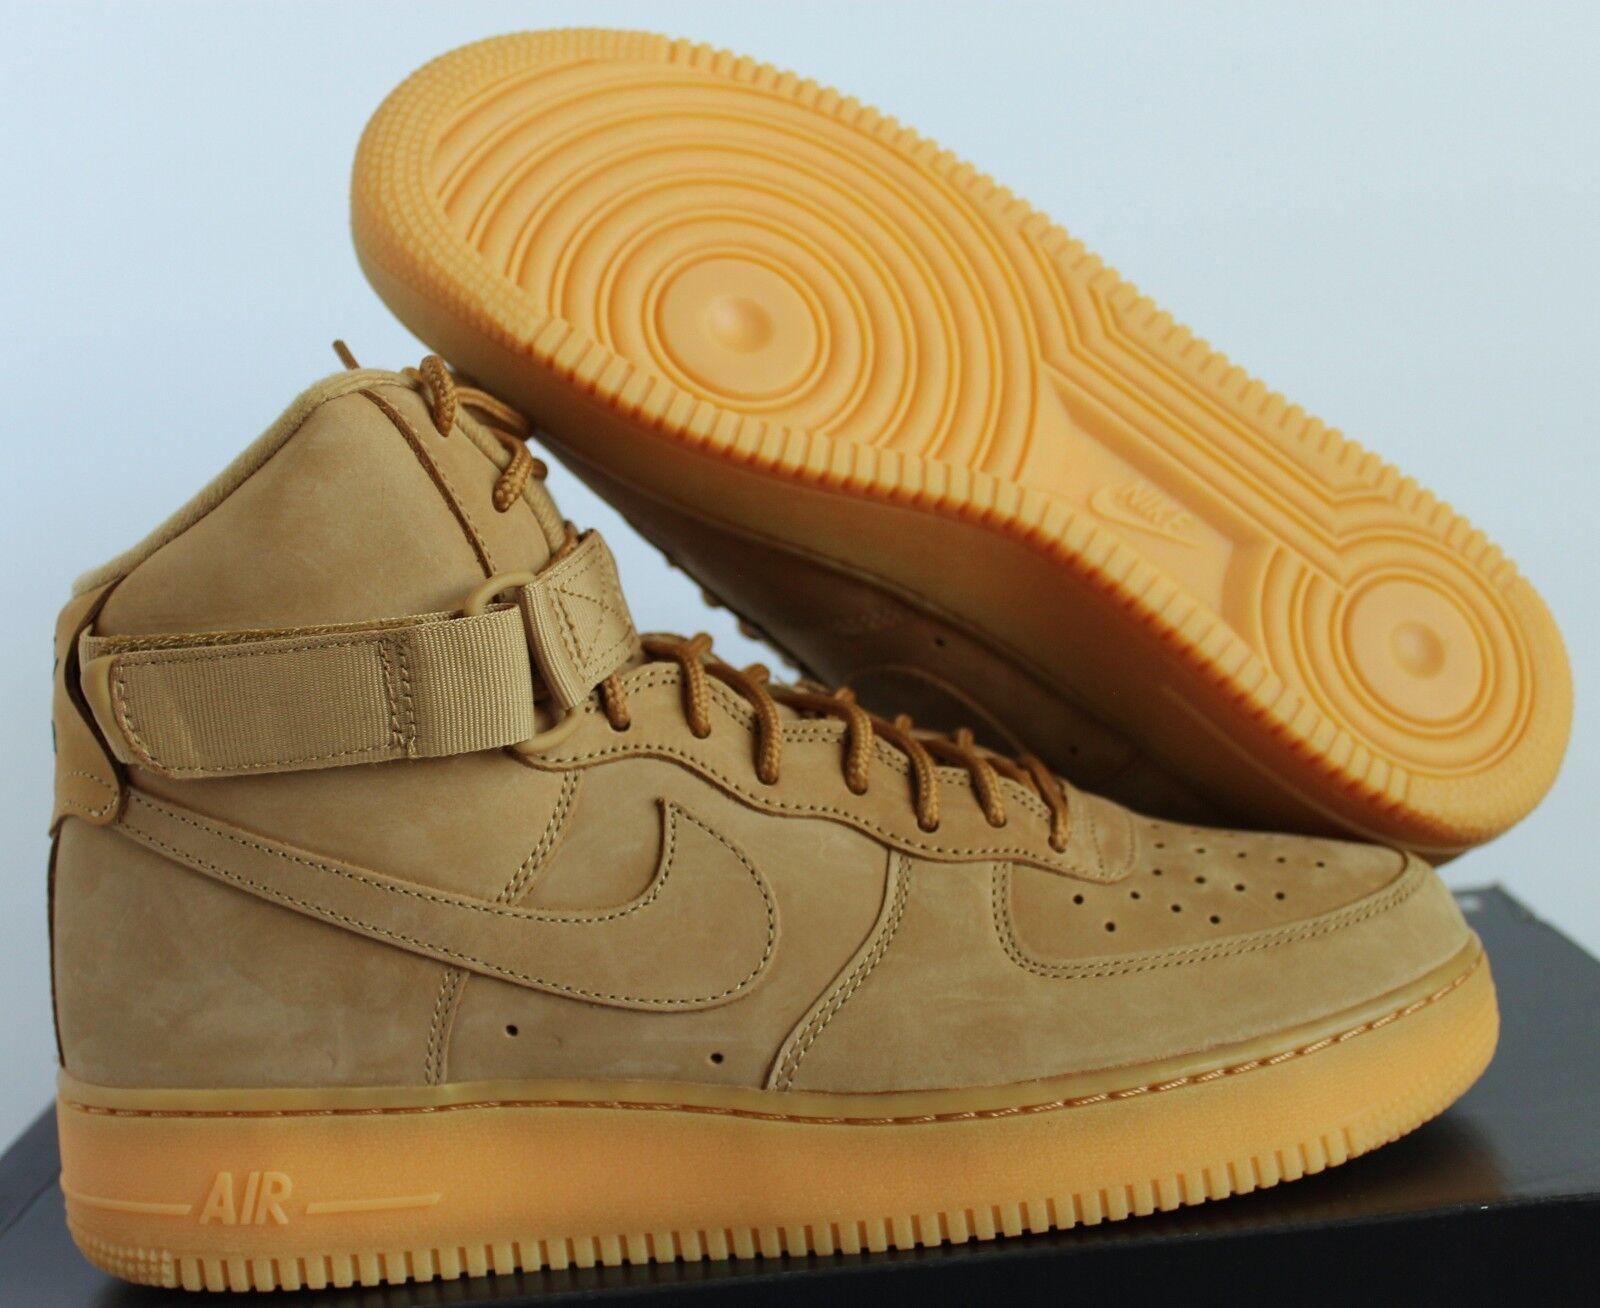 NIKE AIR FORCE 1 HIGH 07 LV8 WB FLAX-WHEAT-GUM Price reduction Cheap women's shoes women's shoes